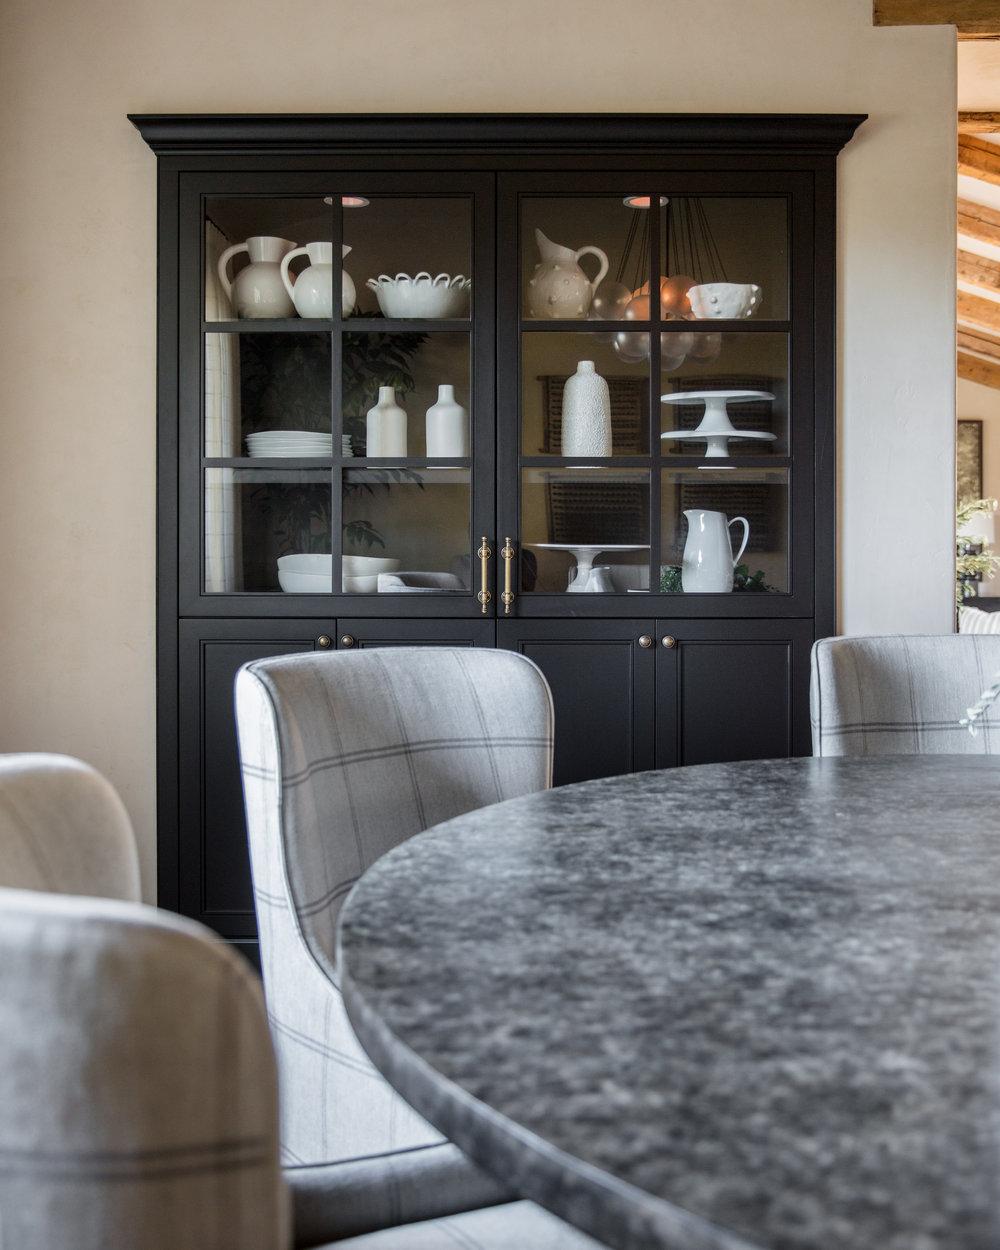 2017-08-30_FletcherRhodes_7th-diningroom-details-1091.jpg